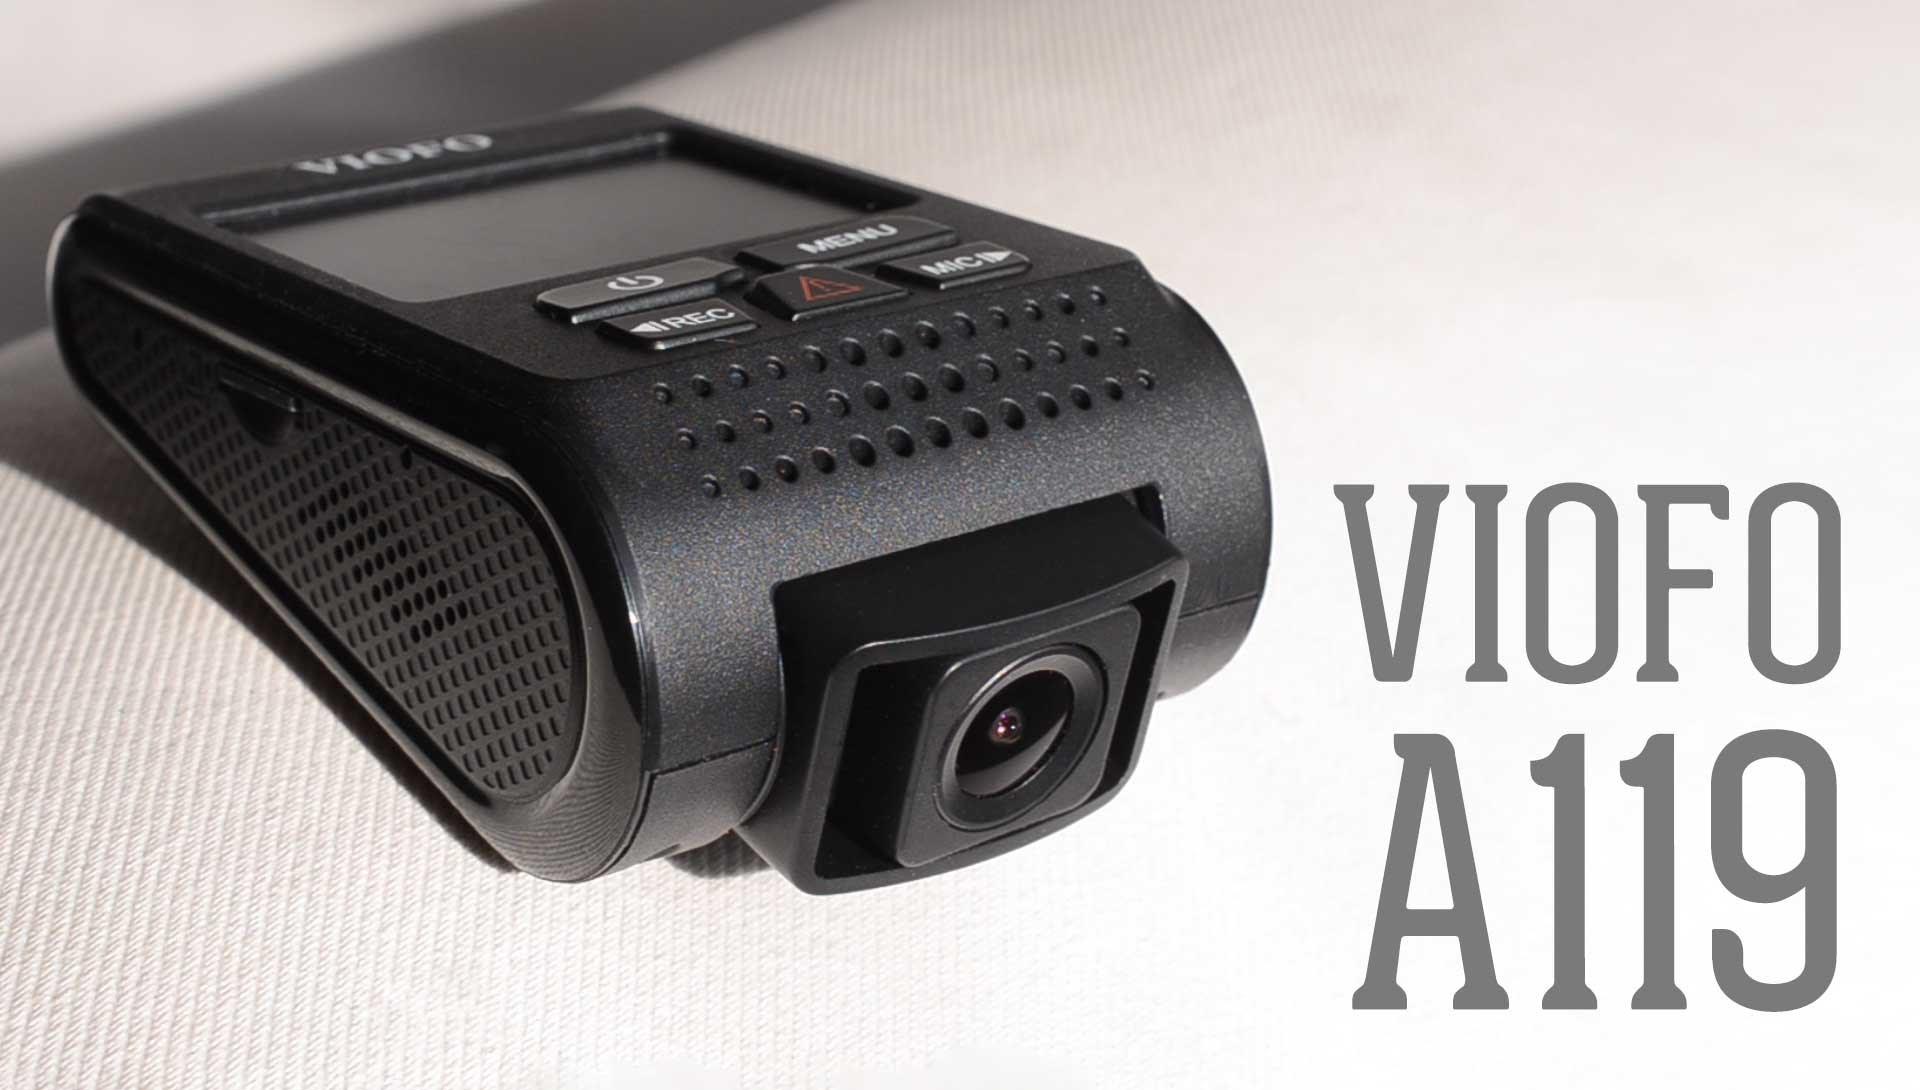 viofo a119s / a119 – מצלמת דרך איכותית ומשתלמת